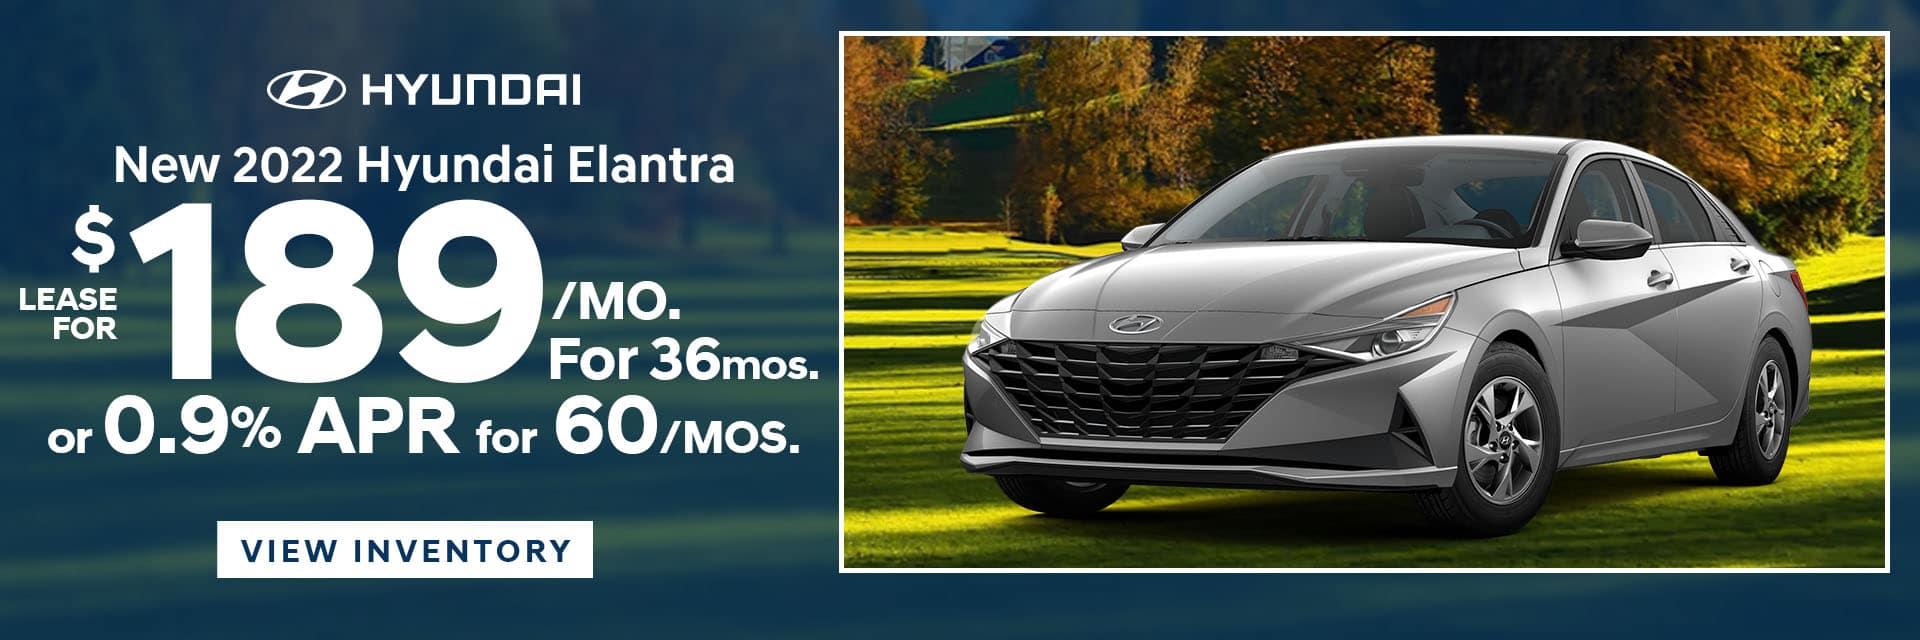 CHOH-October 20212021 Hyundai Elantra copy